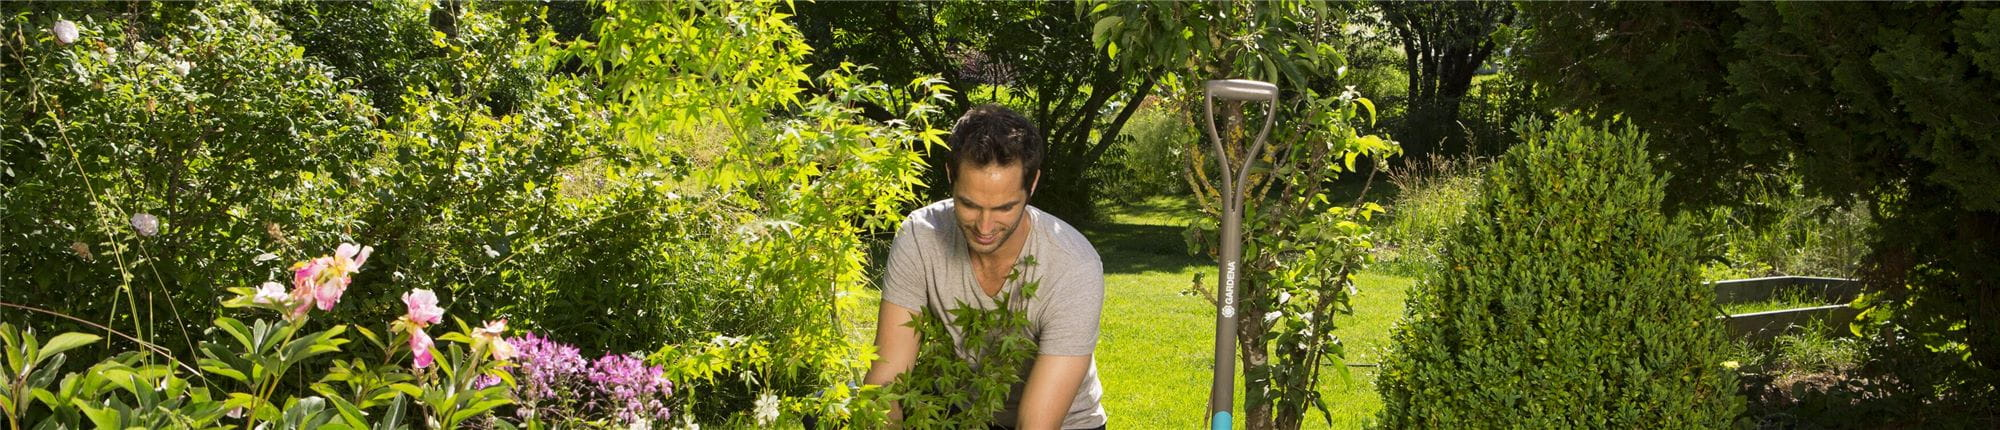 Que planter au balcon et au jardin en novembre ? - GARDENA